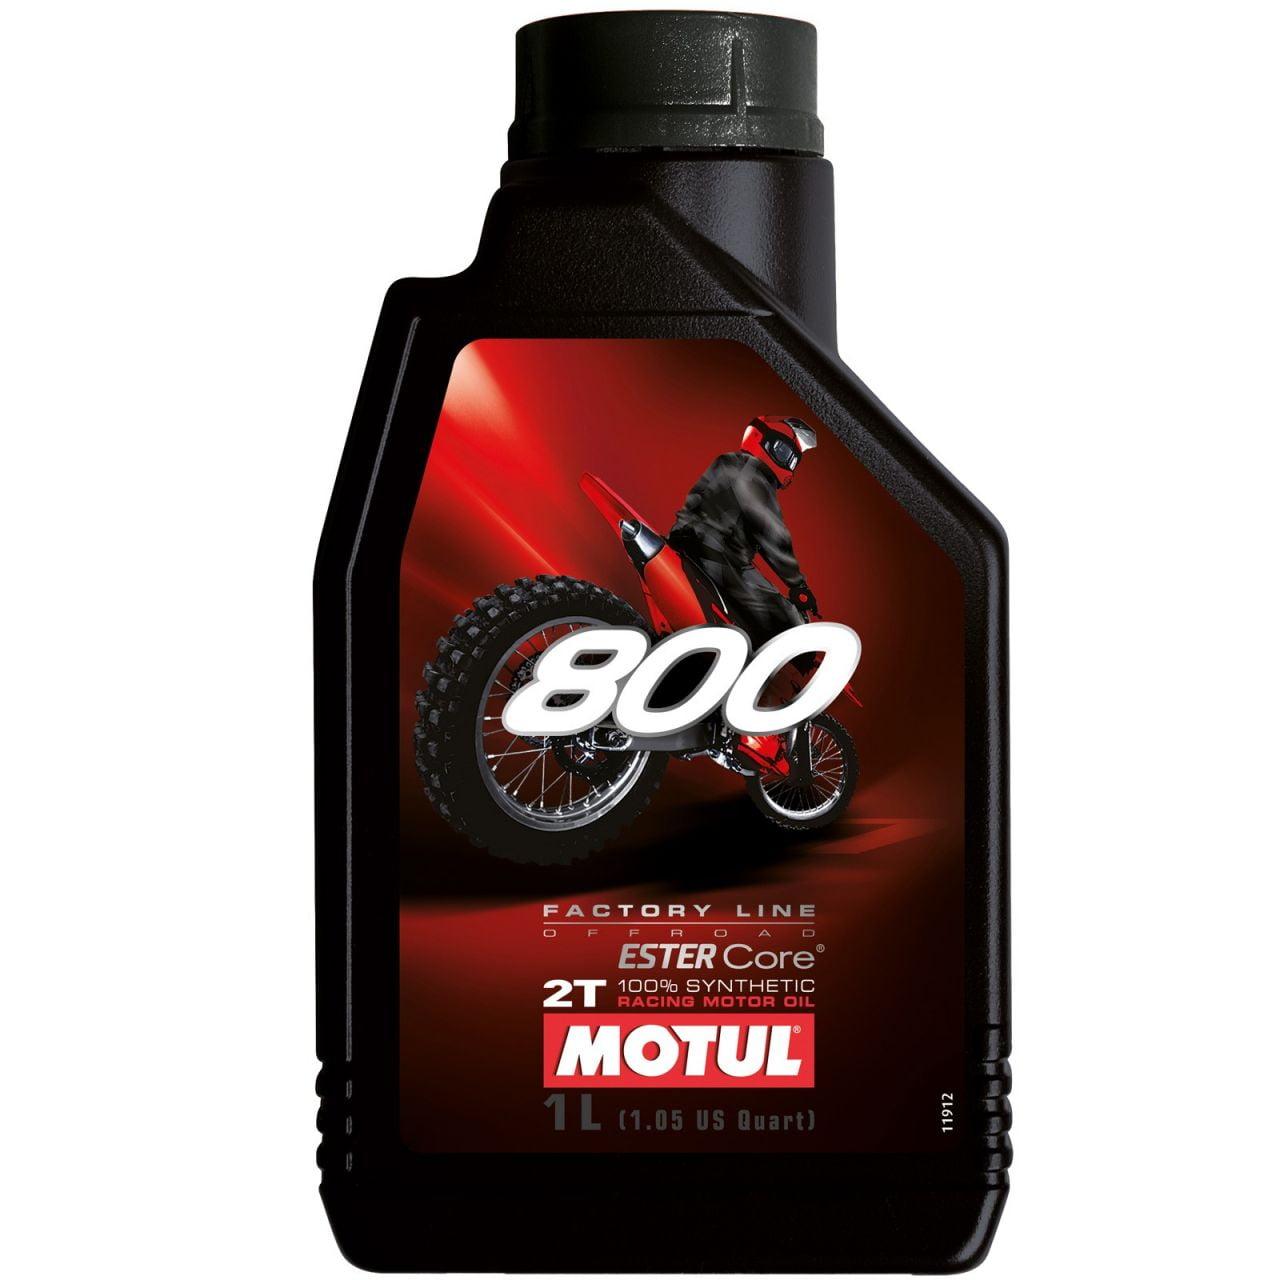 Óleo De Moto Motul 800 Factory Line Off Road 2T Sintético 1lt